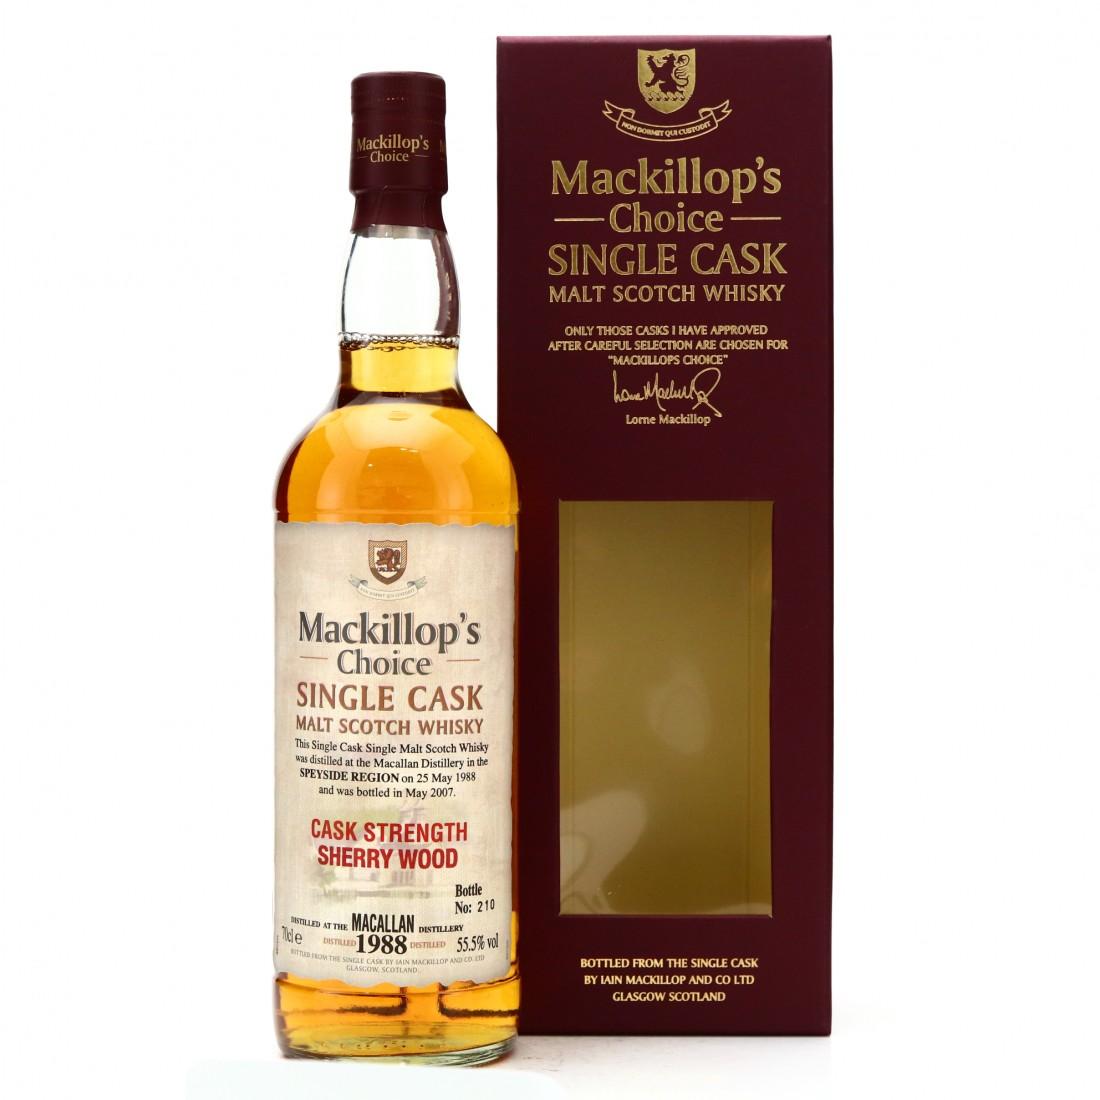 Macallan 1988 Mackillop's Choice